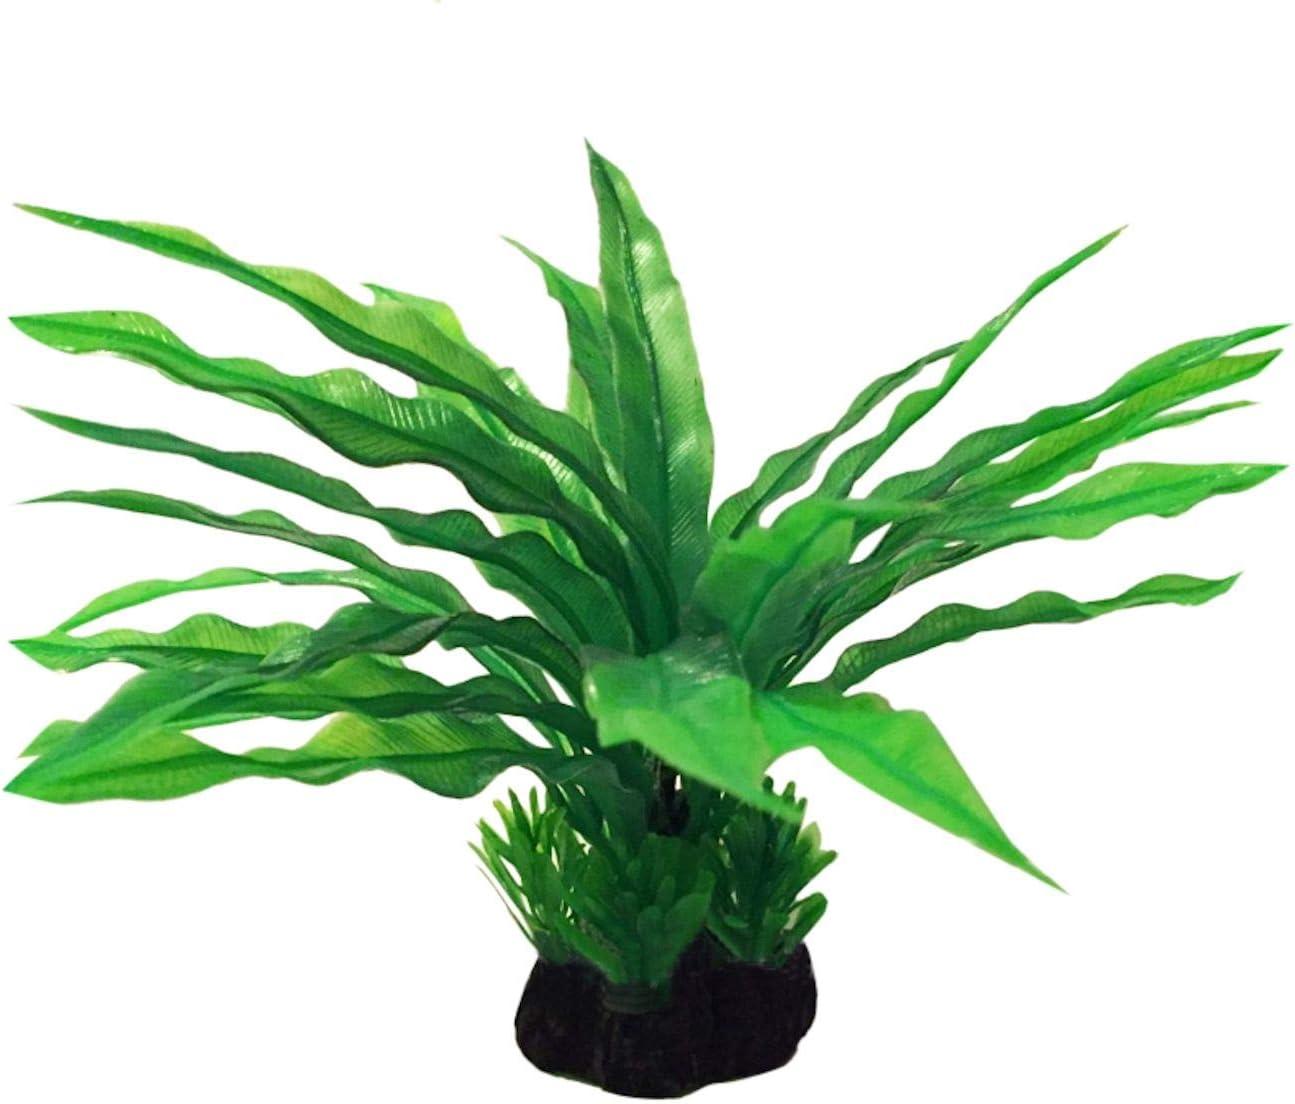 Amazon Com Long Leaf Java Fern Plastic Artificial Plant To Enhance Your Aquascape Fish Tank Aquarium Decor Looks Realistic Beautiful Green Leaves No Maintenance Required Ready To Install Furniture Decor